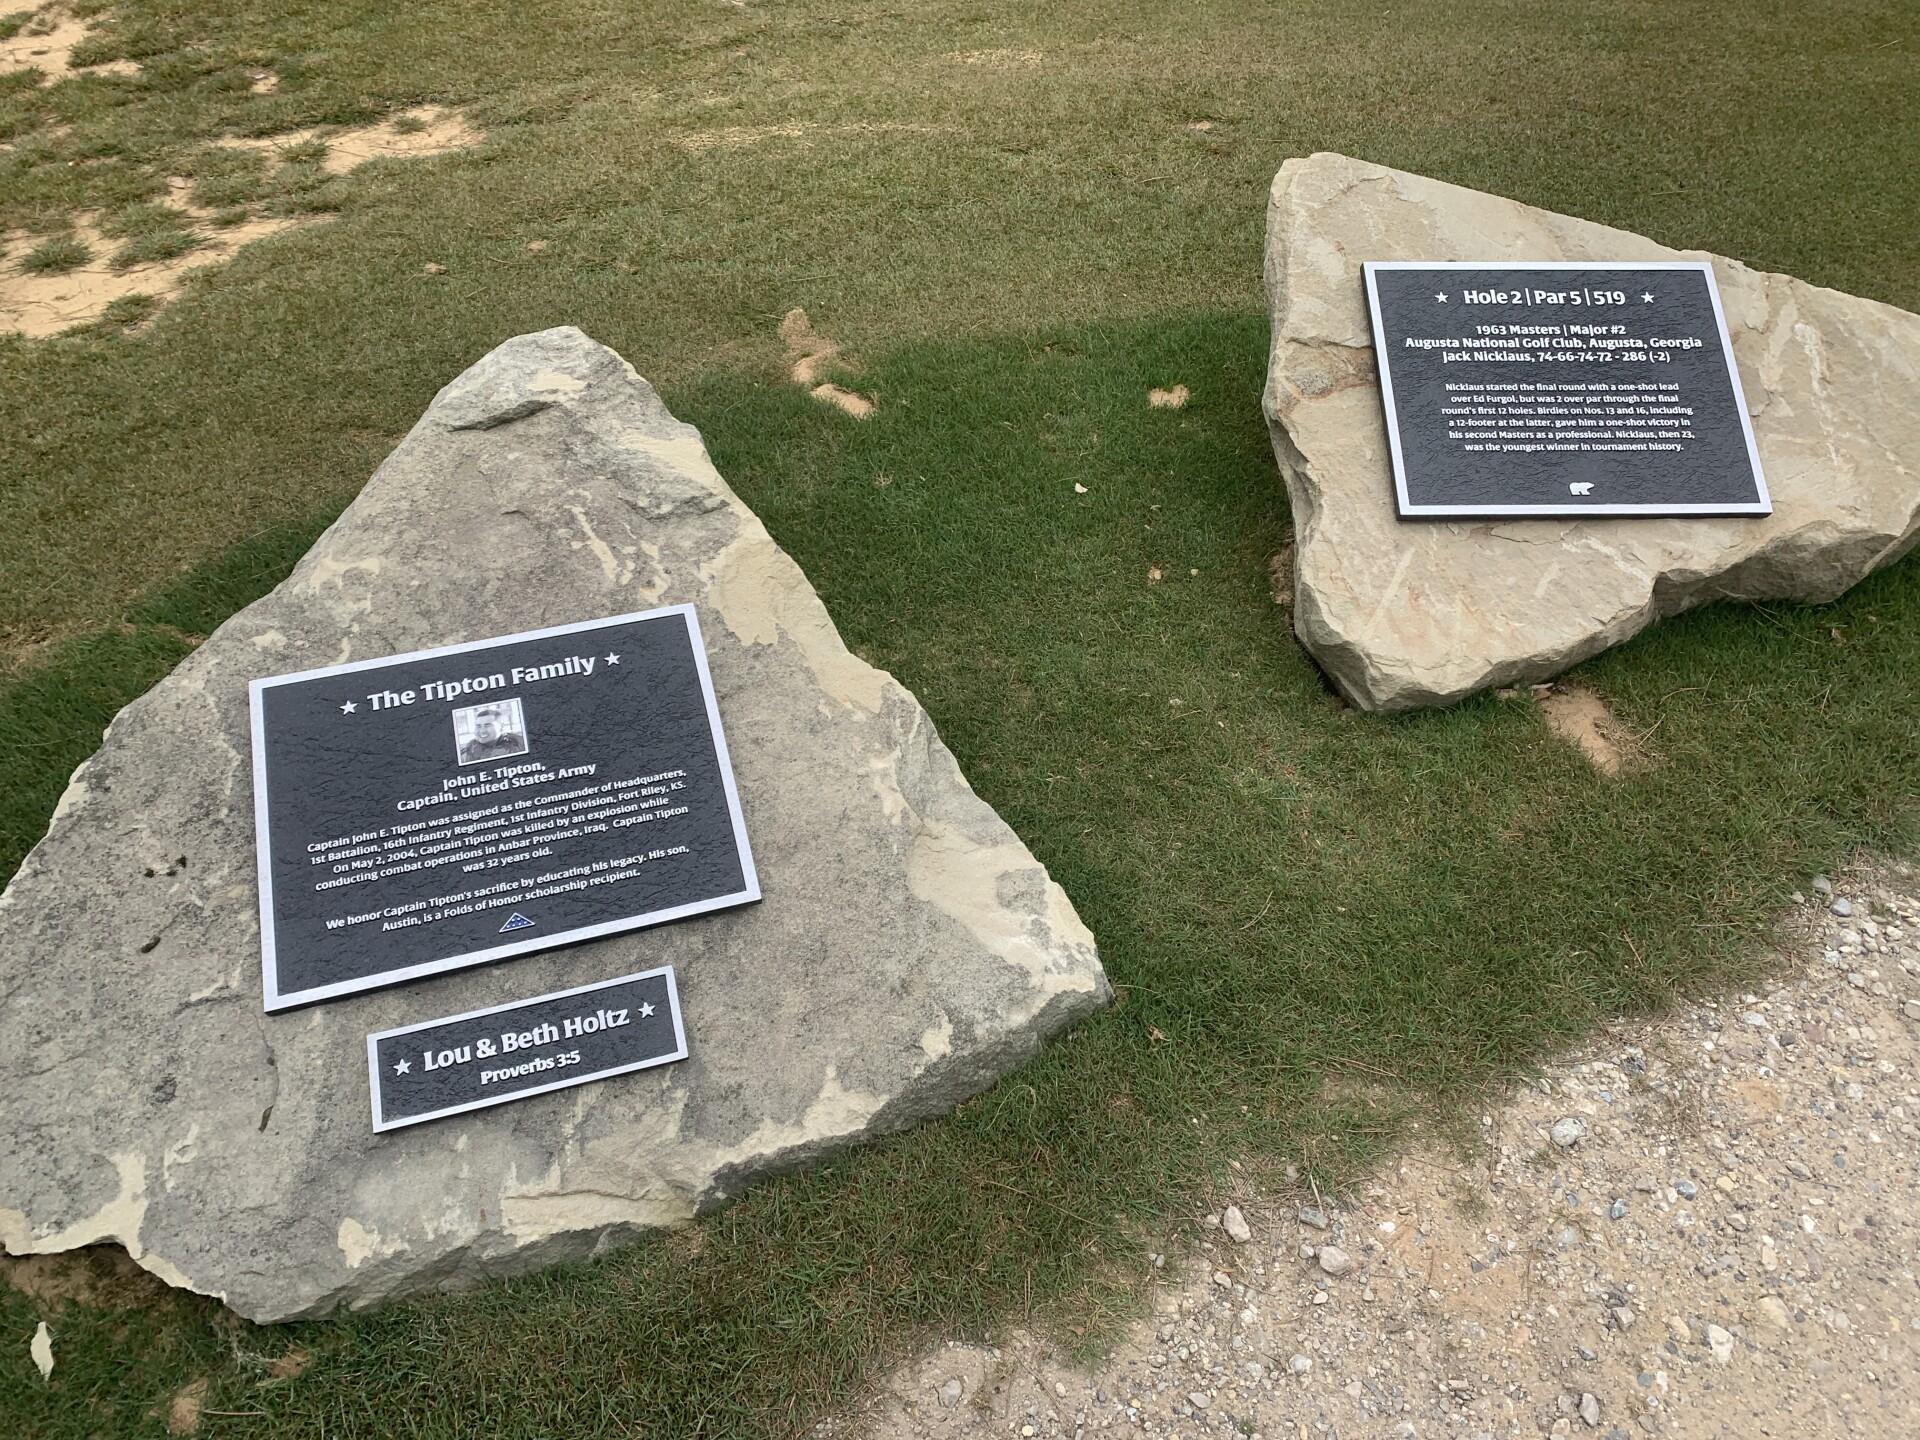 American-Dunes-Golf-Club-33.JPG